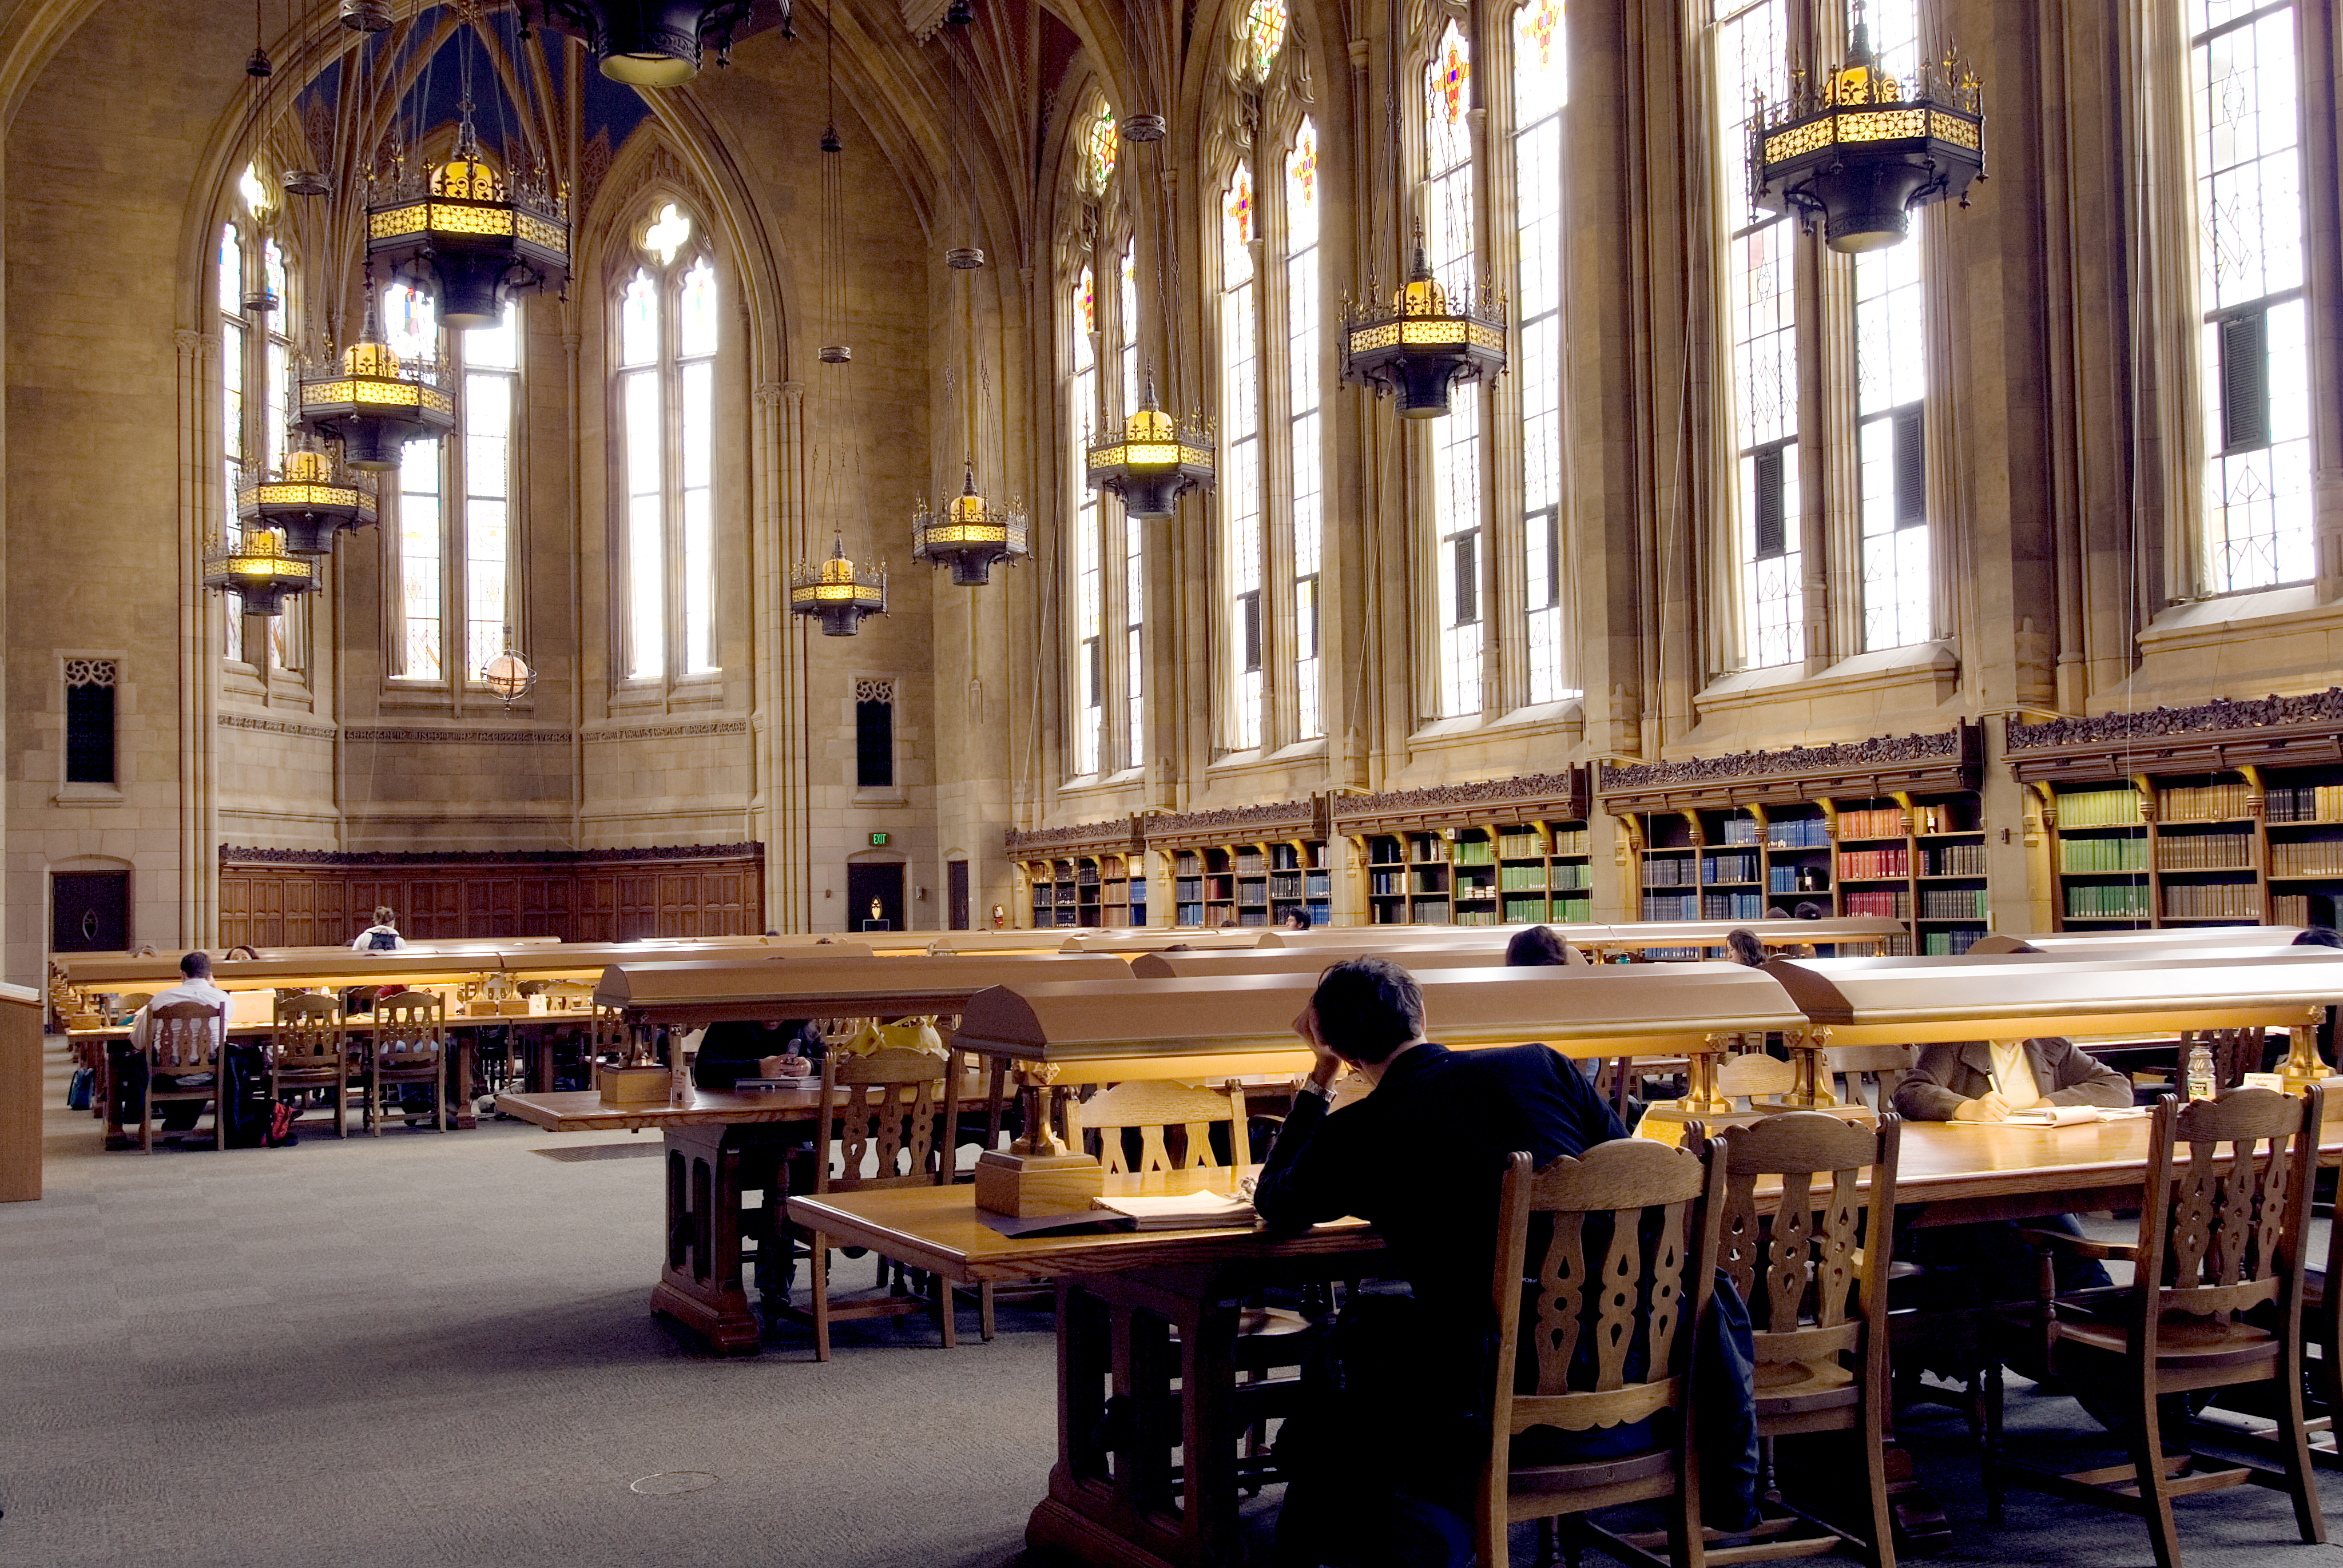 Suzzallo Library interior, University of Washington